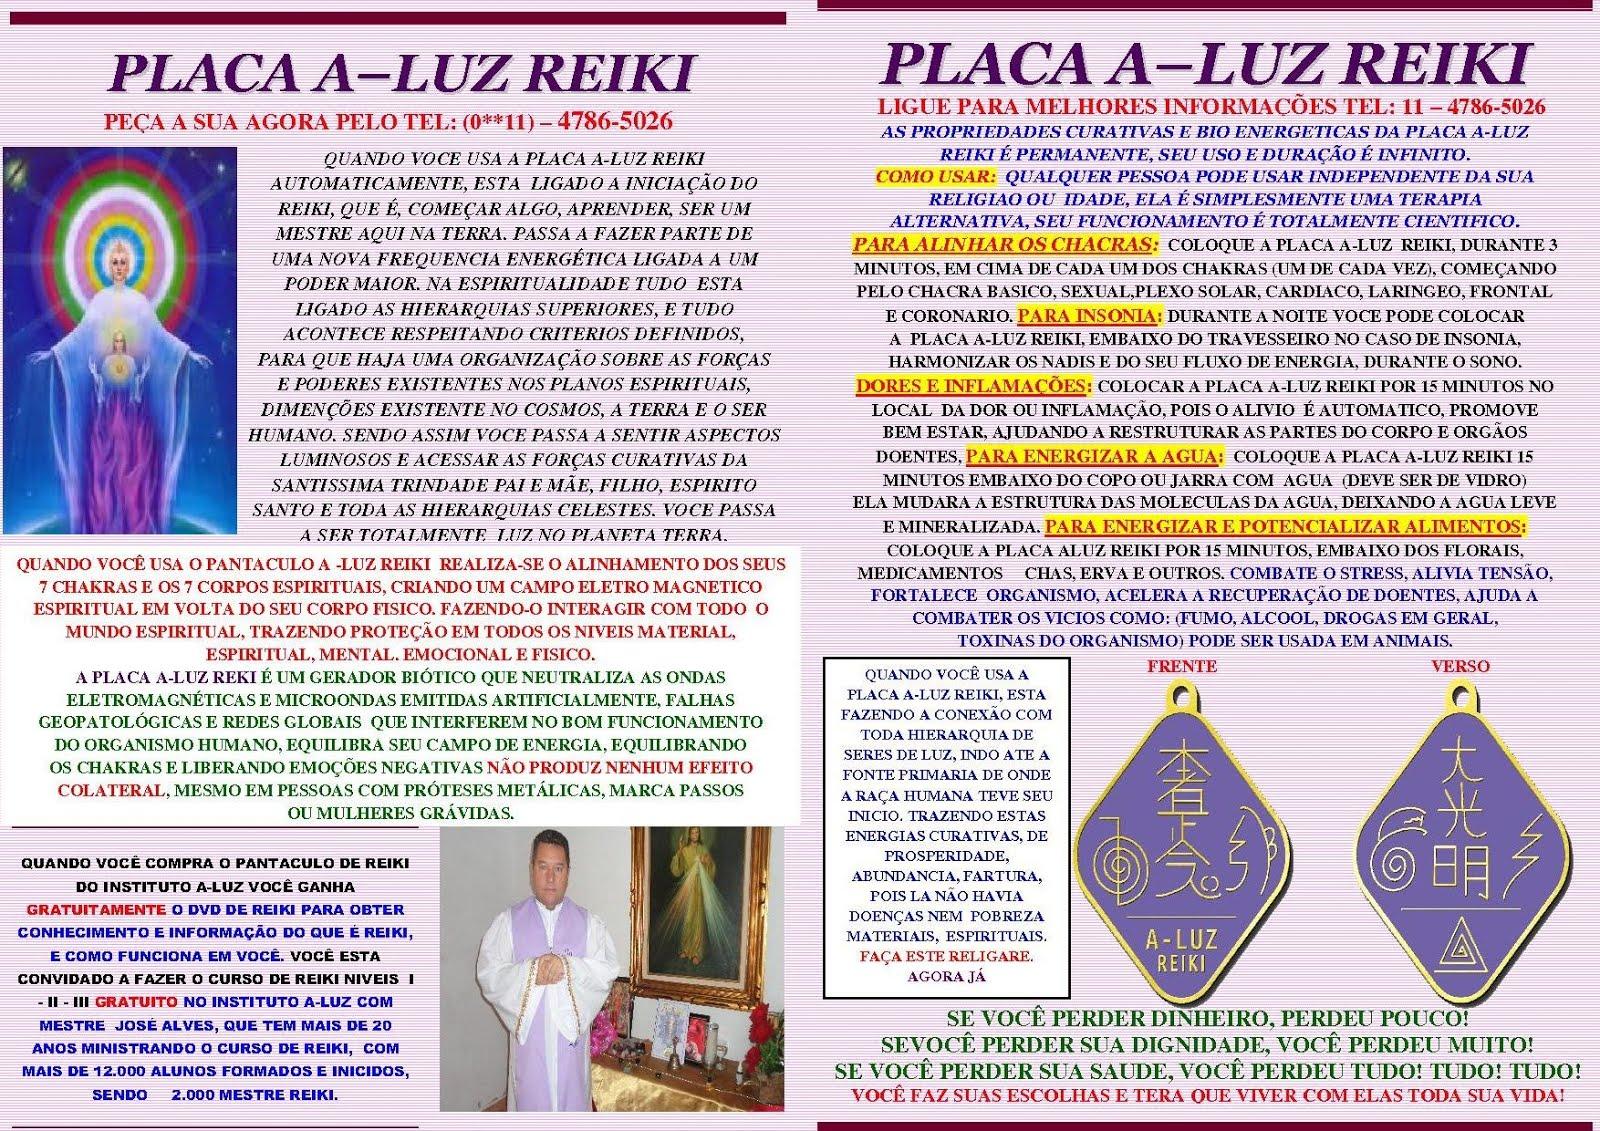 PLACA A-LUZ 2